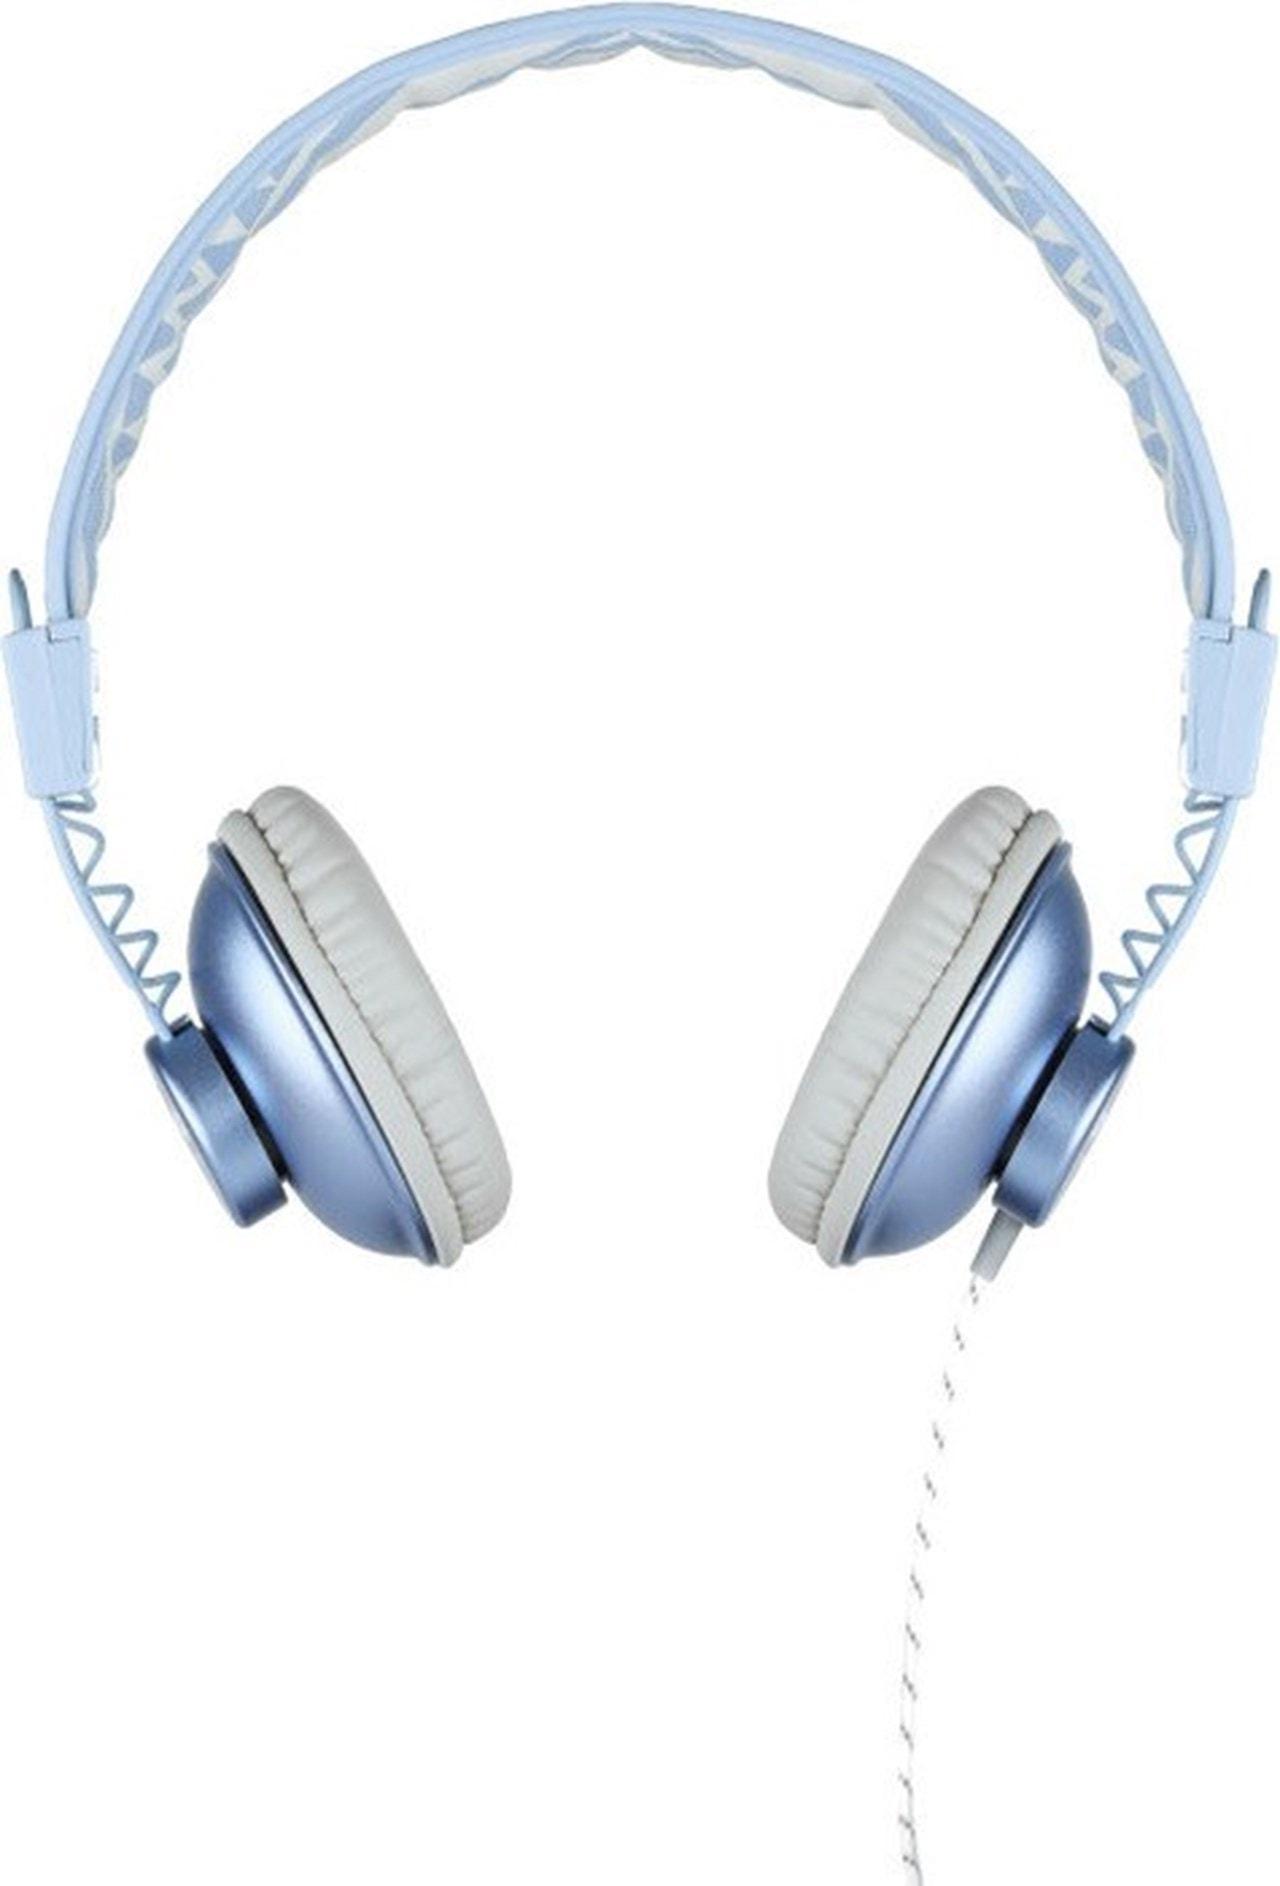 House Of Marley Positive Vibration Blue Hemp Headphones W/Mic (hmv Exclusive) - 2